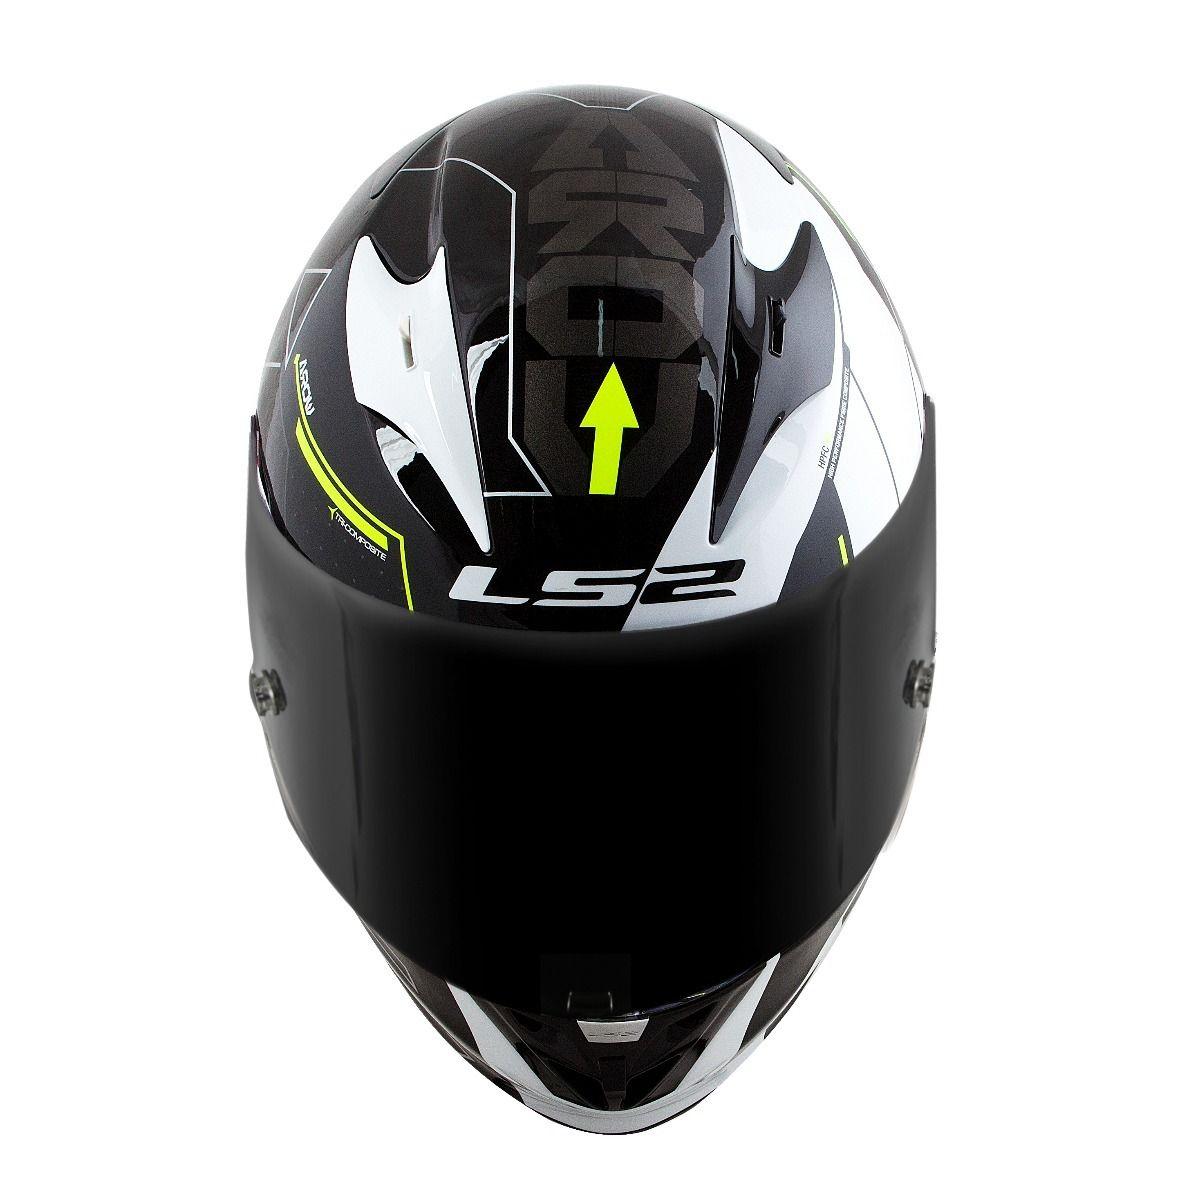 Capacete LS2 FF323 Arrow R Techno Preto/Branco/Amarelo  - Nova Centro Boutique Roupas para Motociclistas